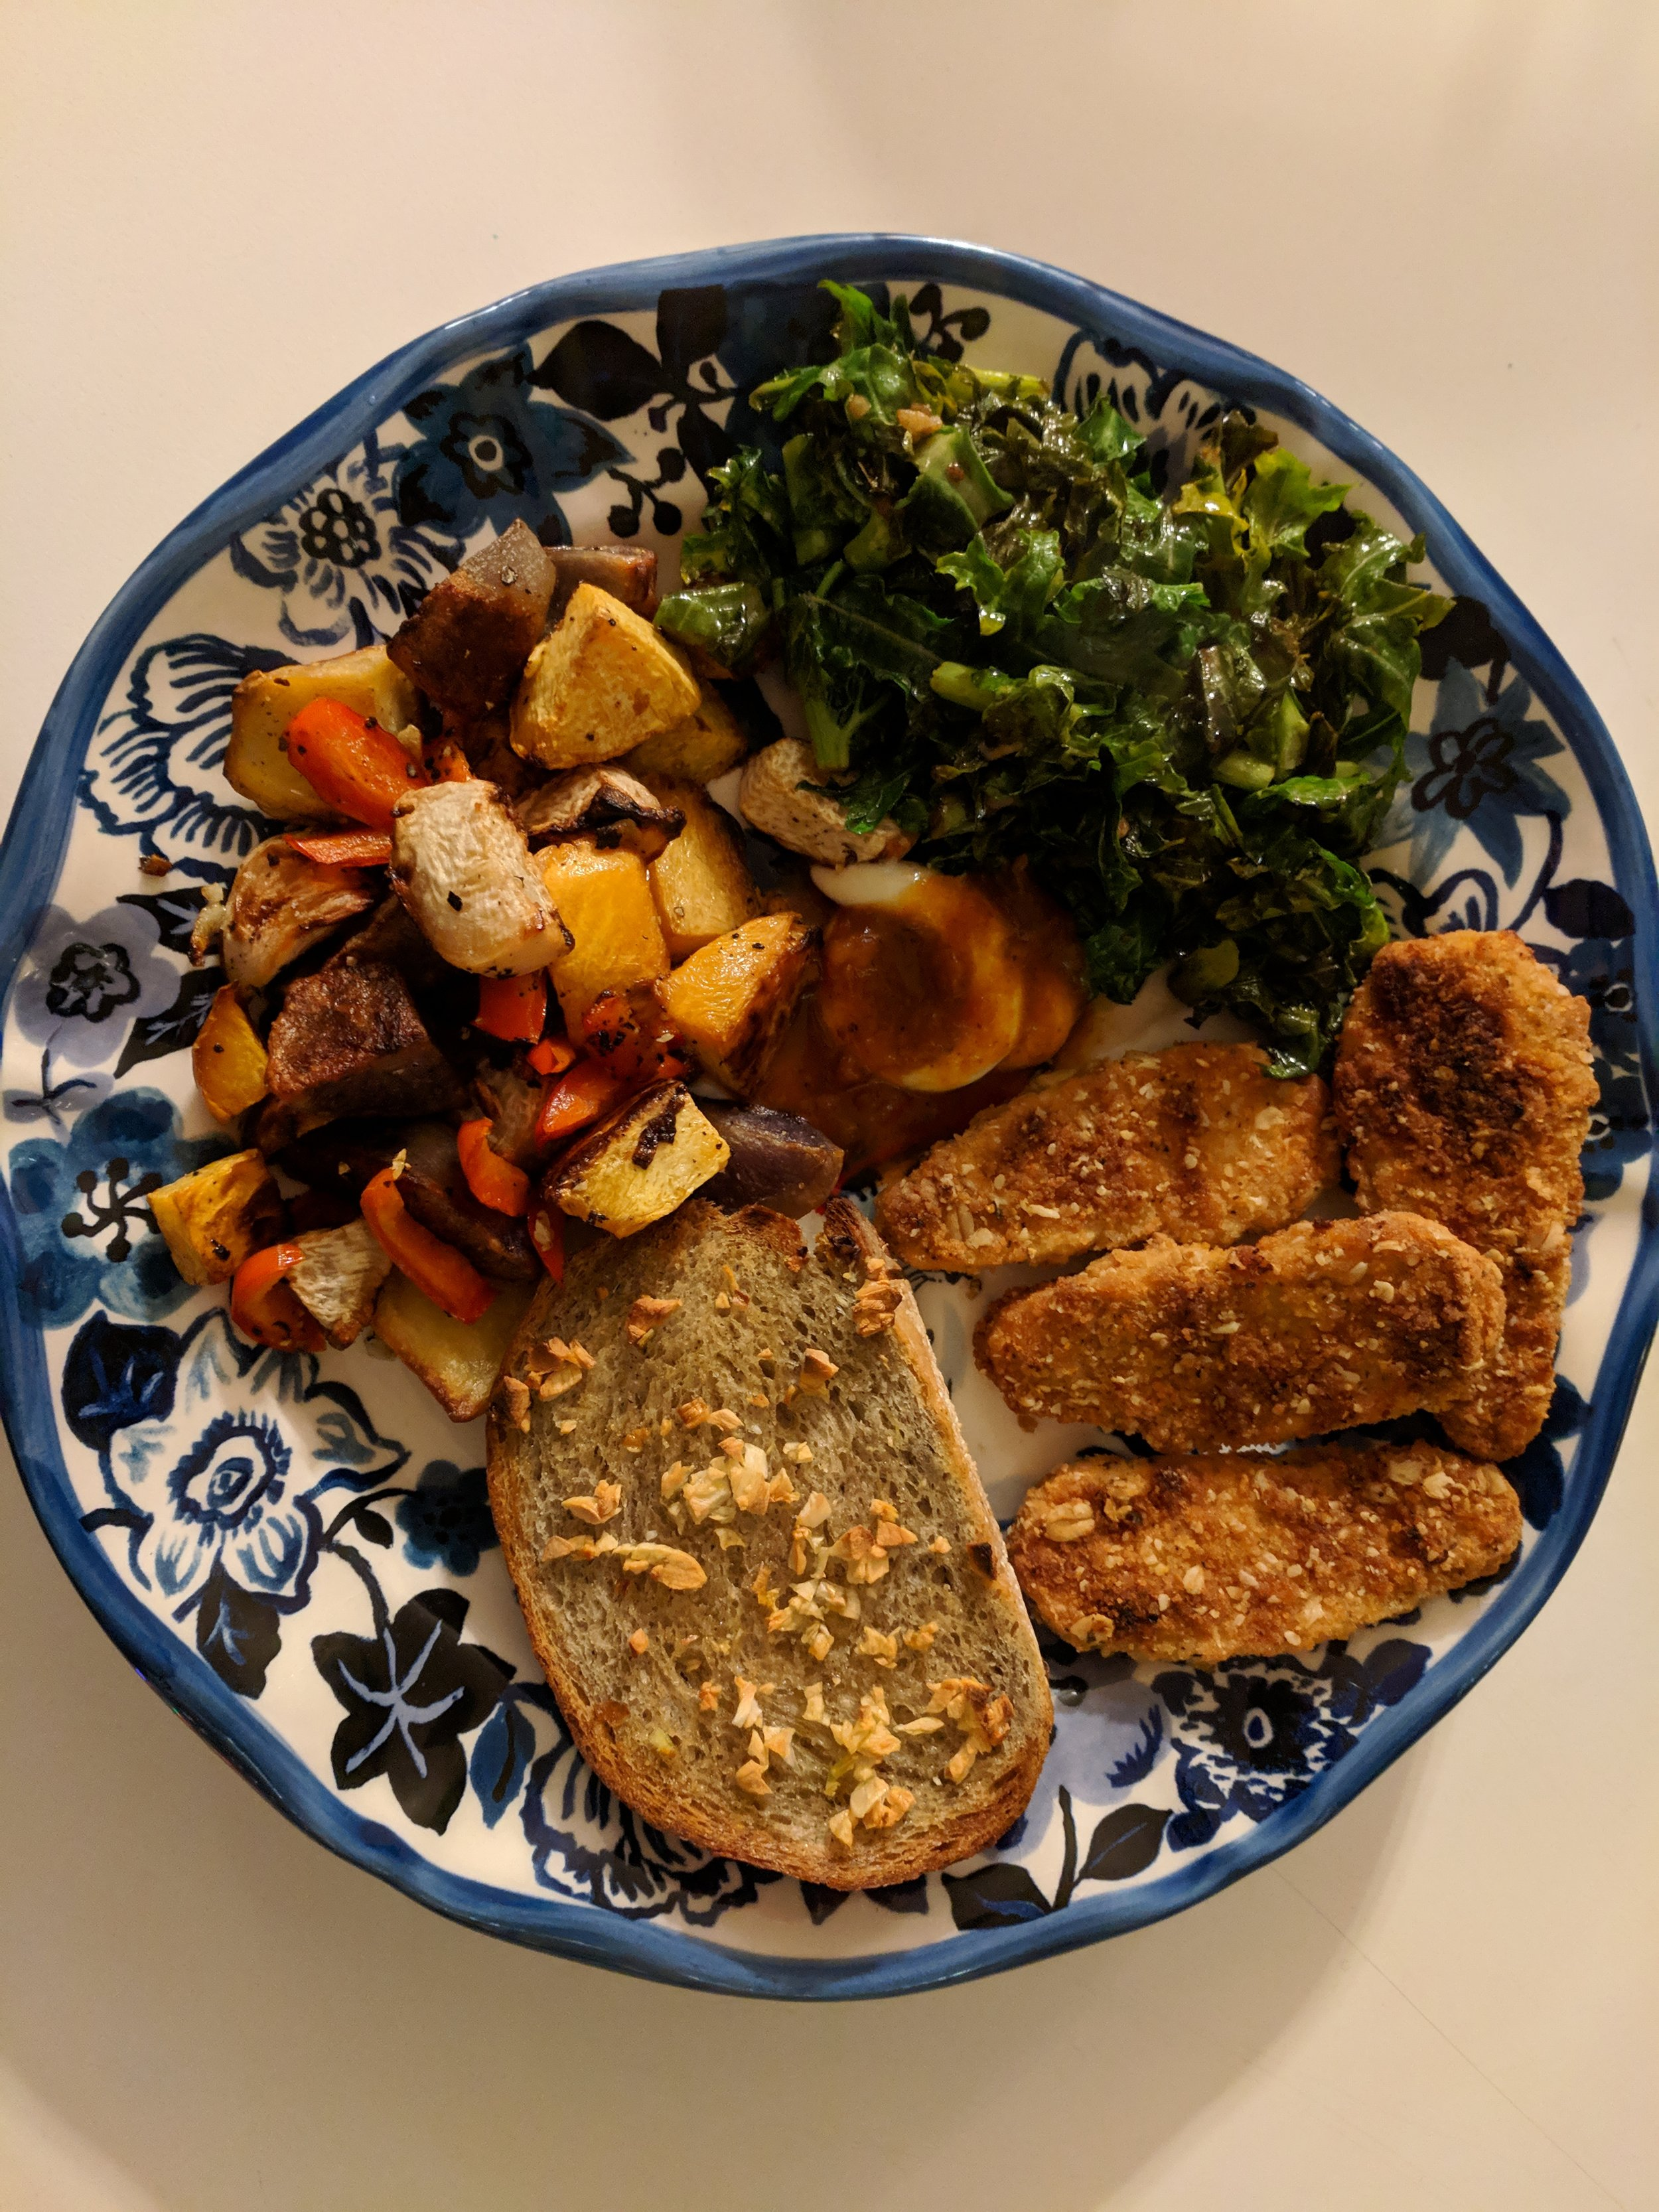 roasted root veggies, garlic toast, wilted kale, gardein chickin'